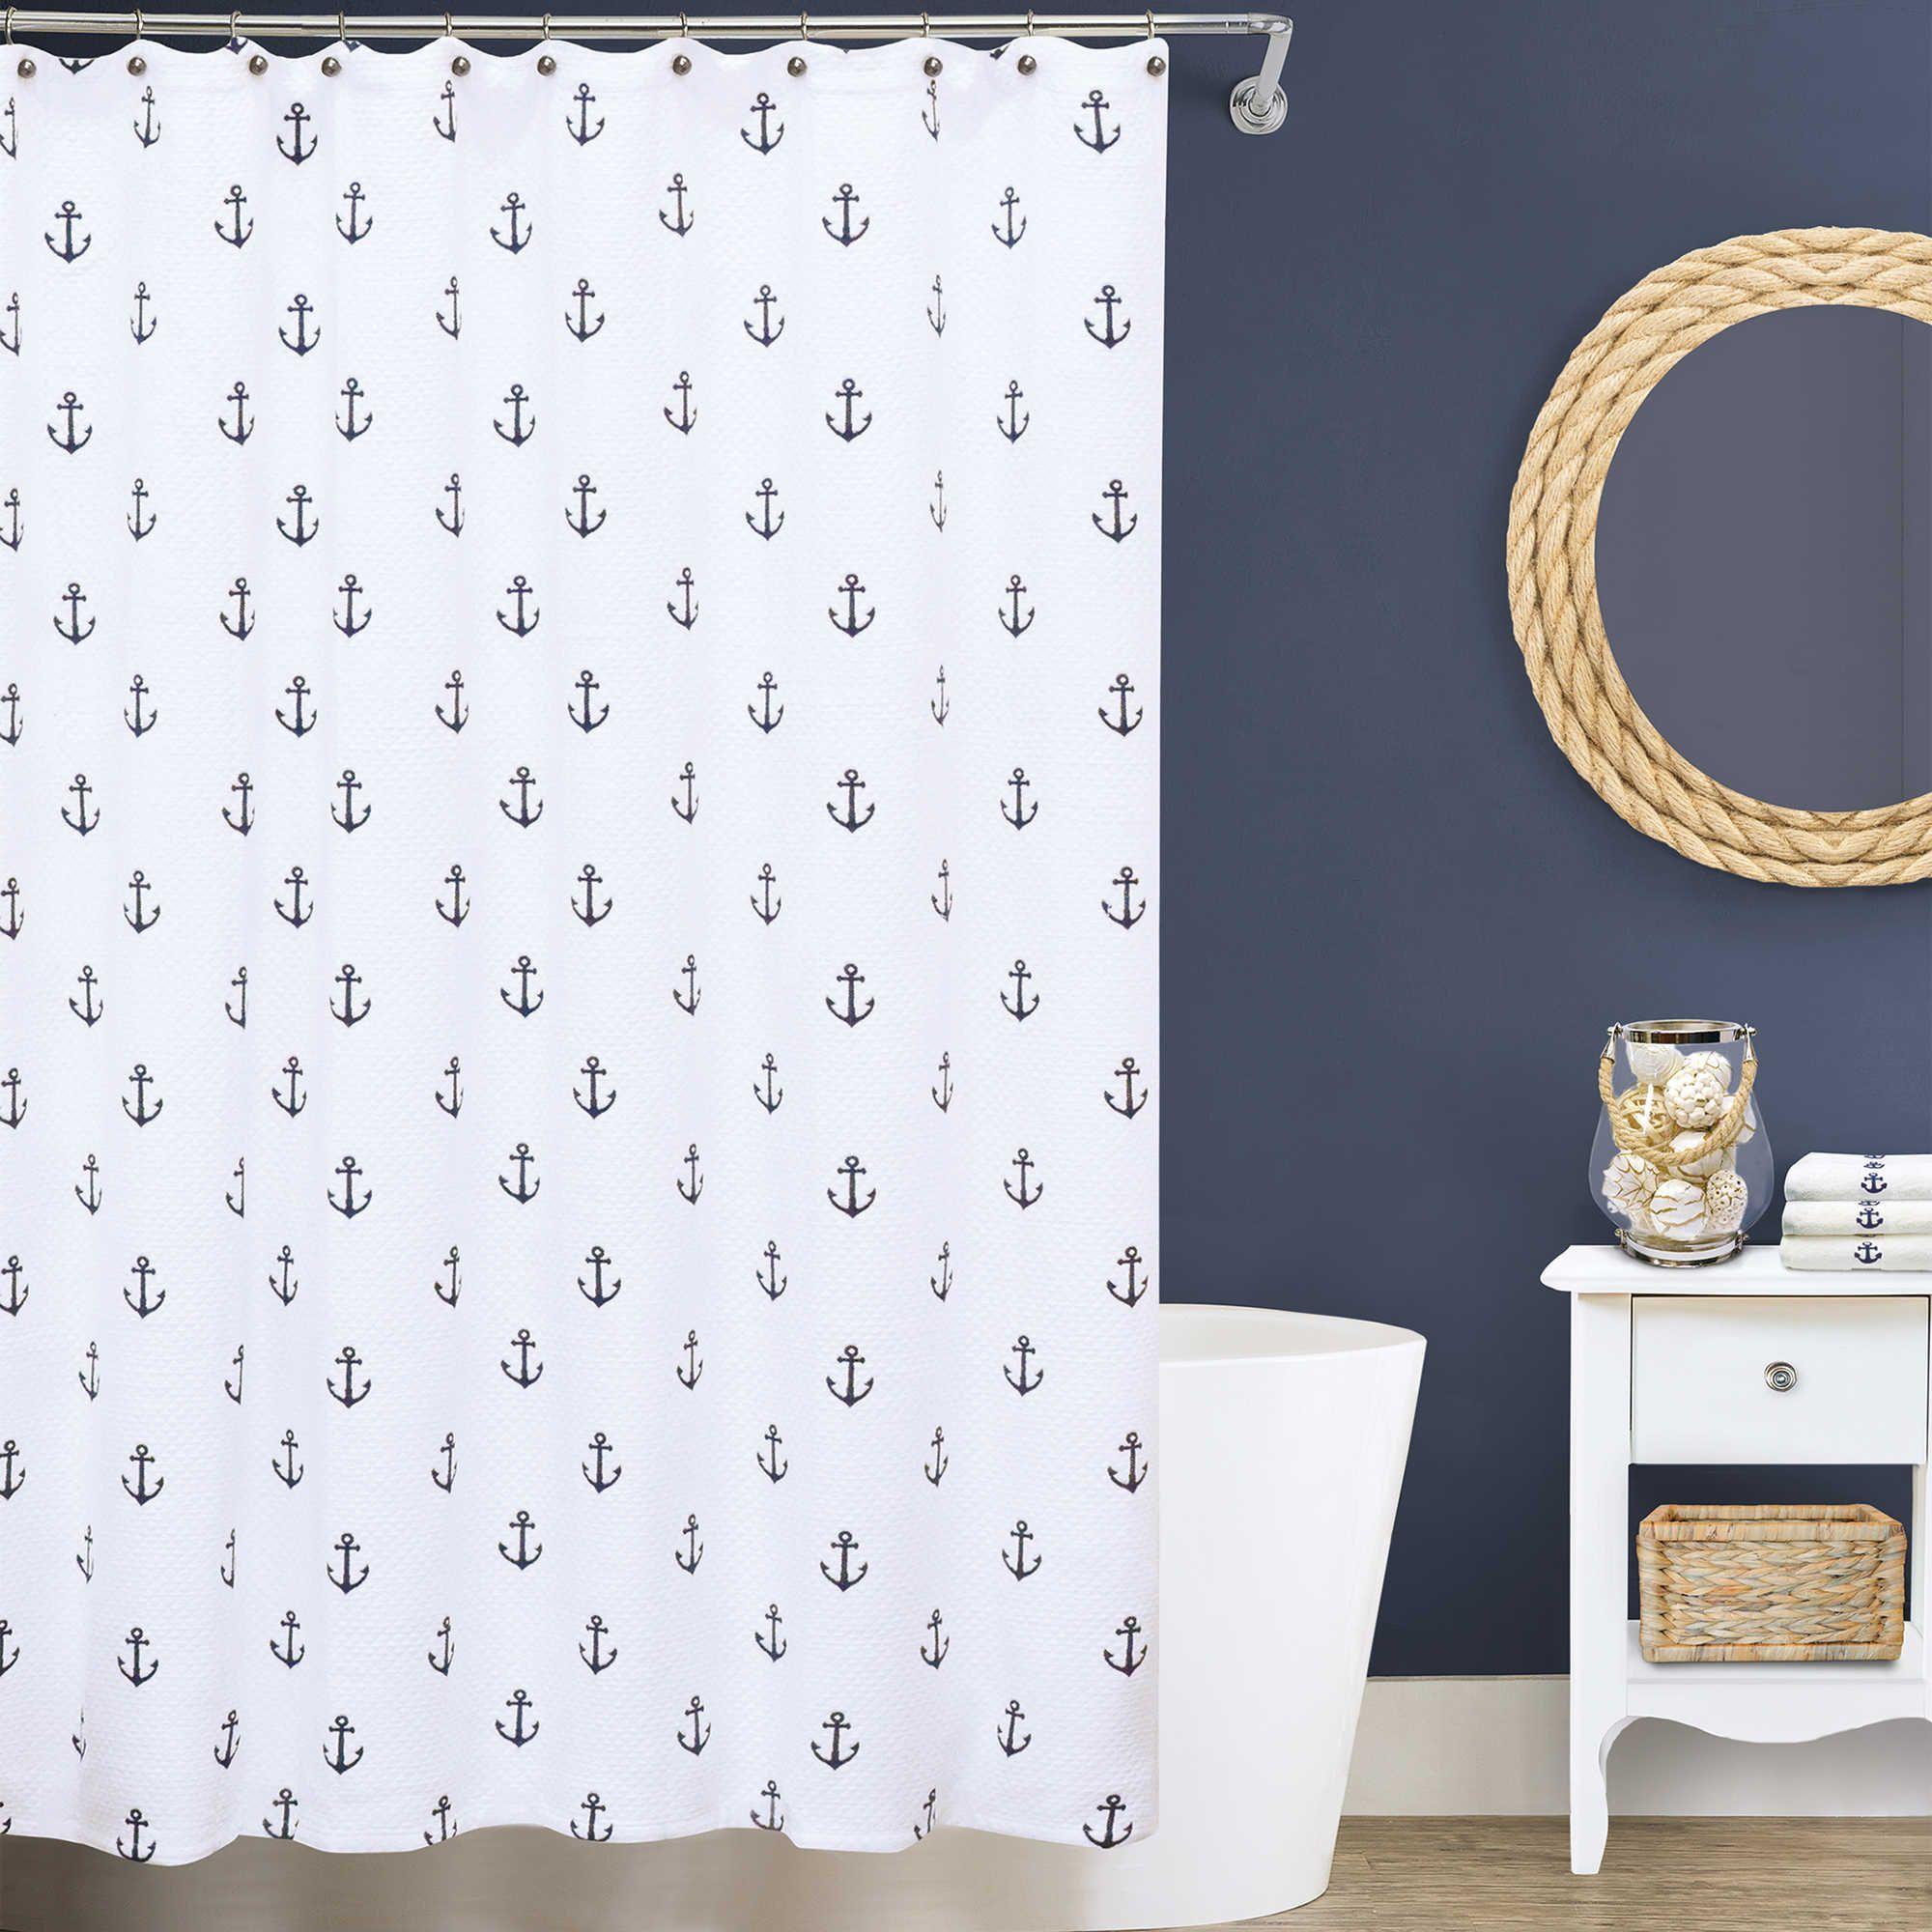 Lamont Home Anchors Matelass Shower Curtain